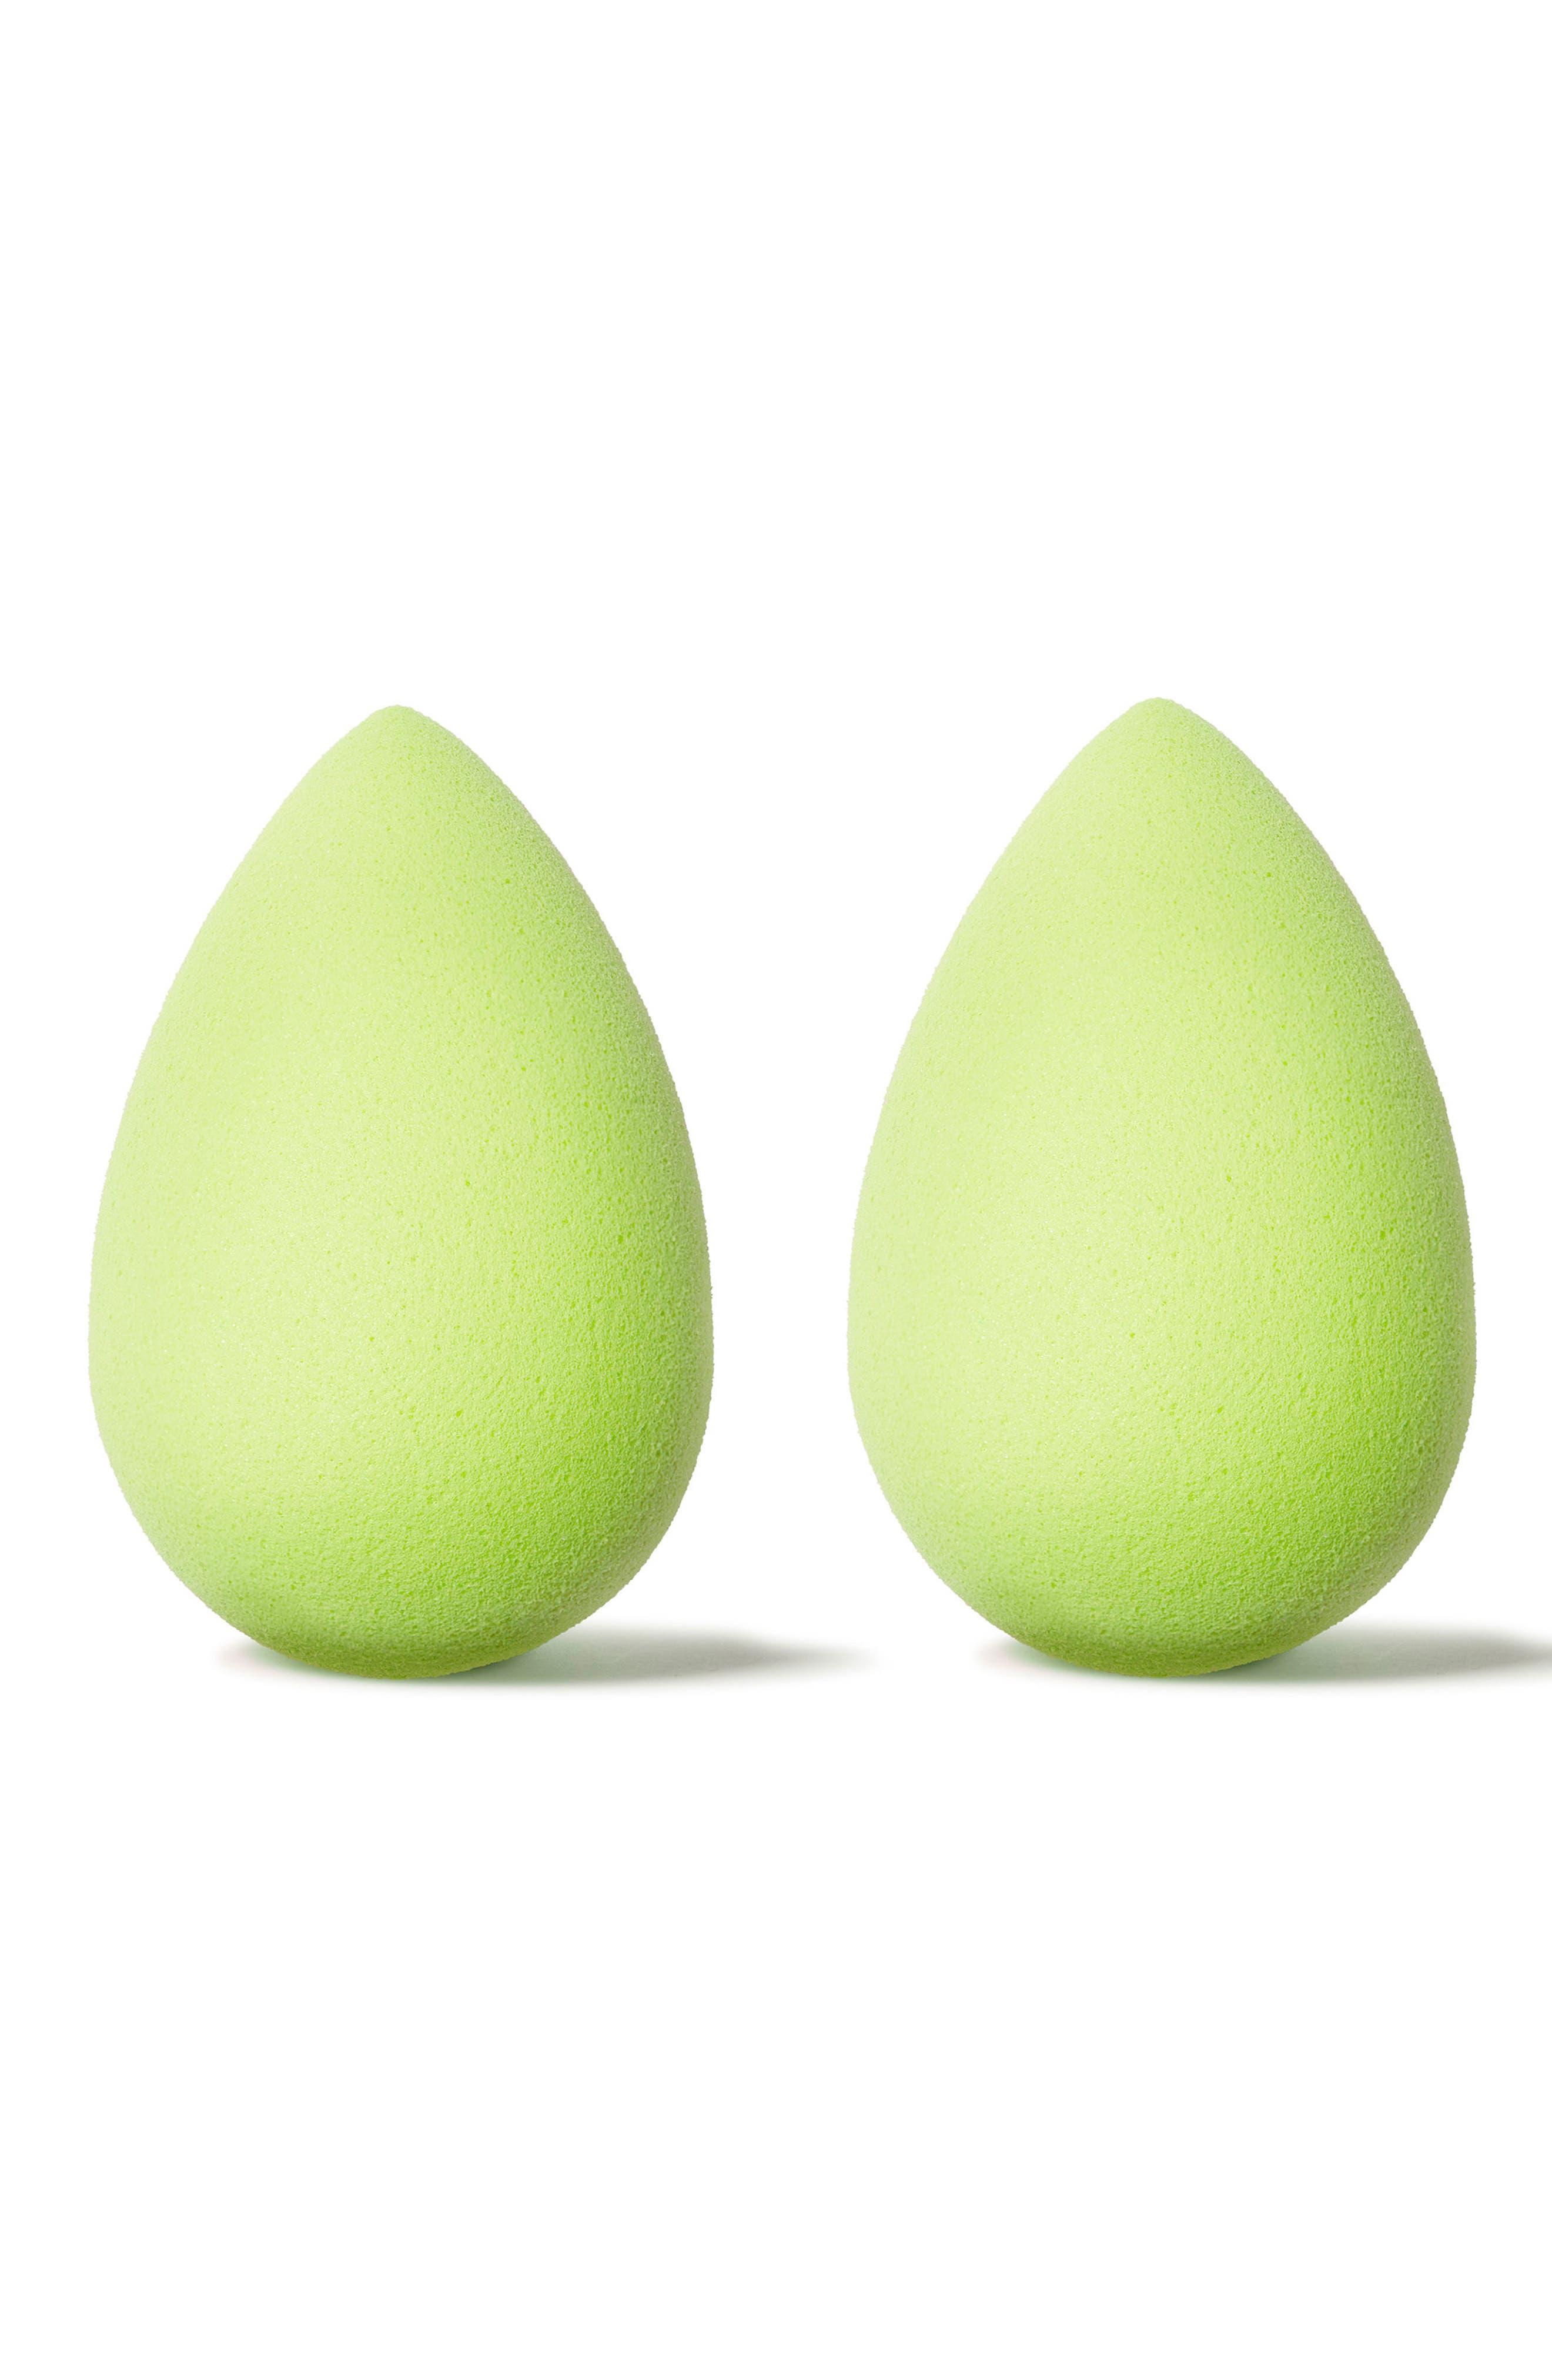 Main Image - beautyblender® micro.mini Highlighting & Contouring Makeup Sponge Applicator